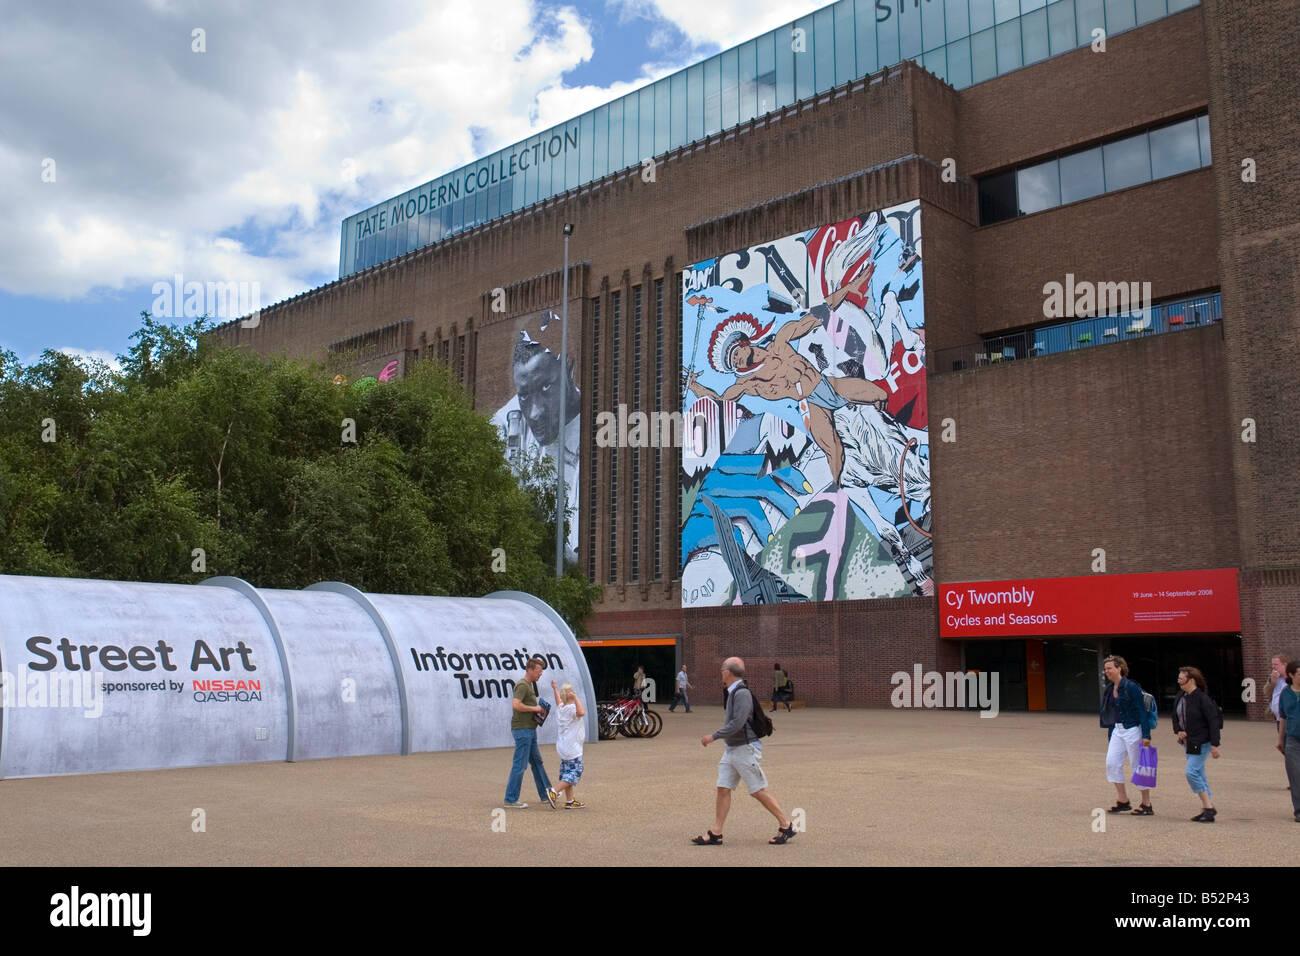 Graffiti art information - Stock Photo Street Art Exhibition Graffiti Art Work Painted On The Tate Modern London Uk